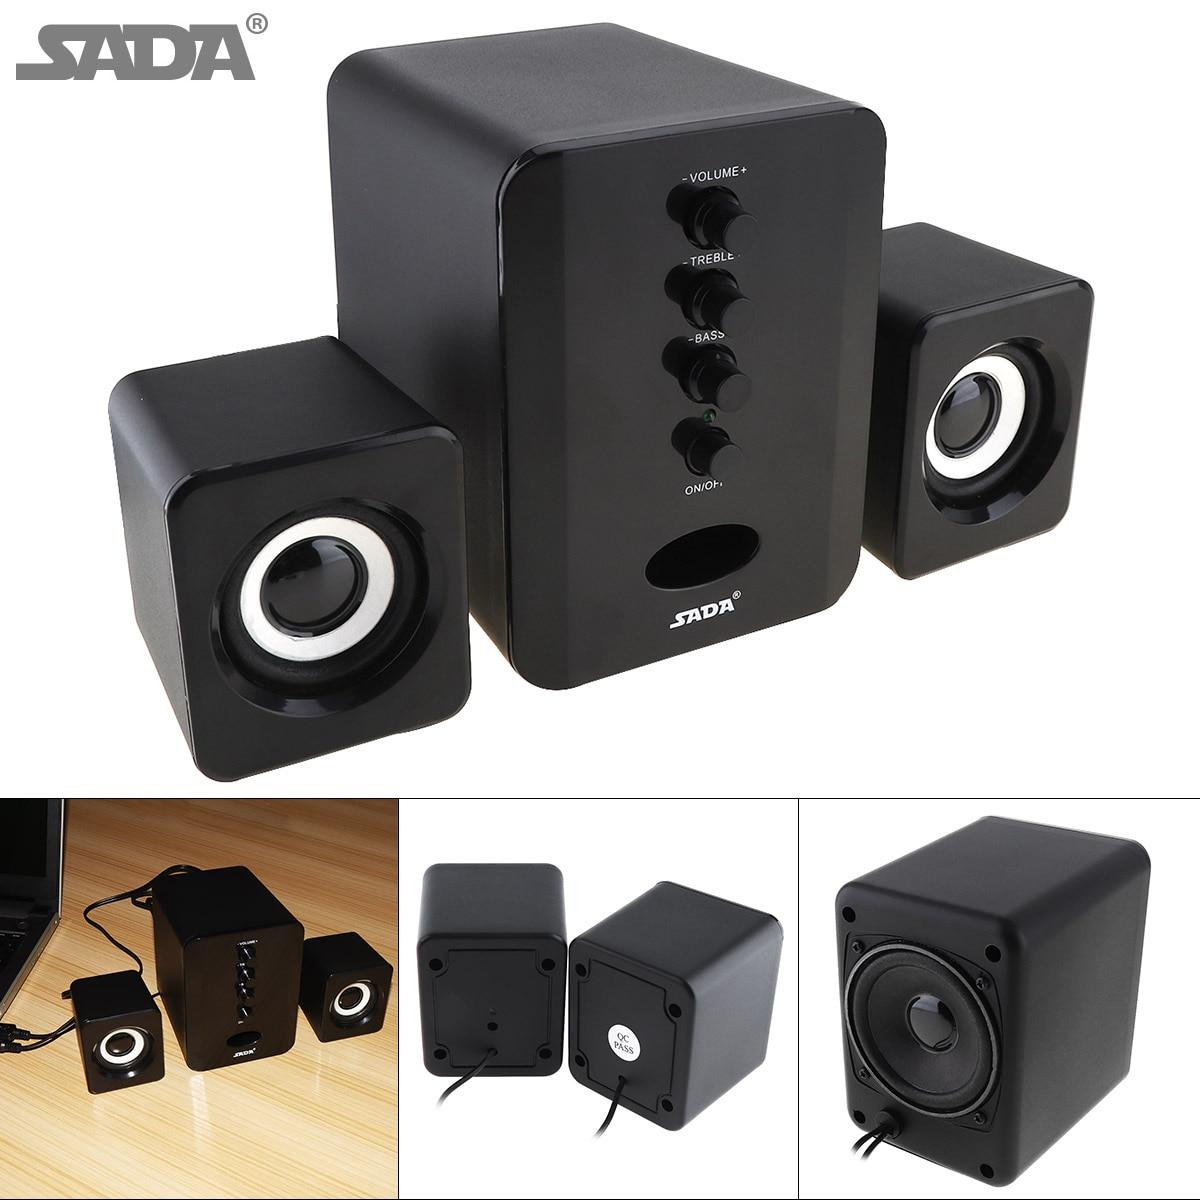 SADA USB D-202 D-203 Full Range Computer Speakers 3D Stereo Subwoofer Portable Combination PC Speakers for Phone TV Tablet MP3